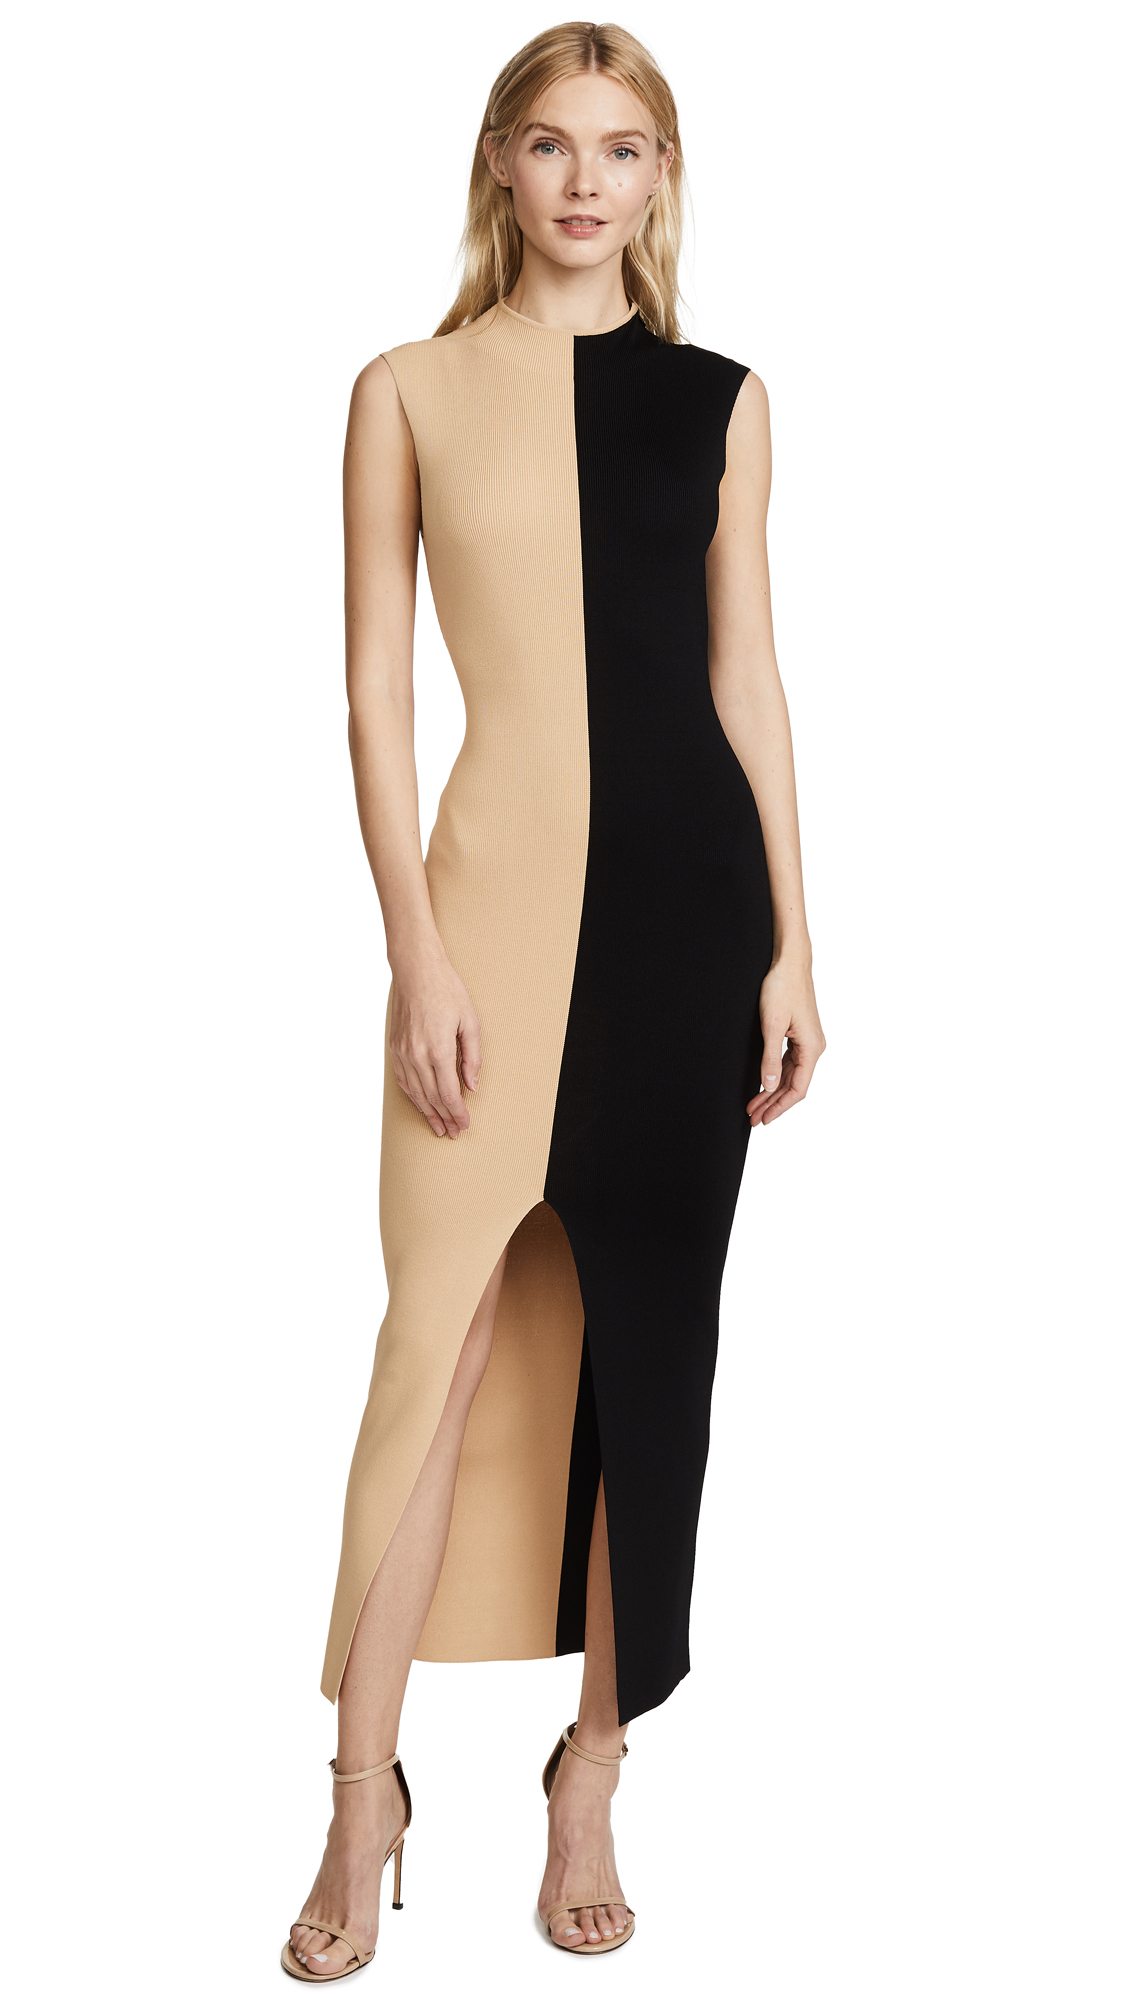 Solace London Intarsia Dress